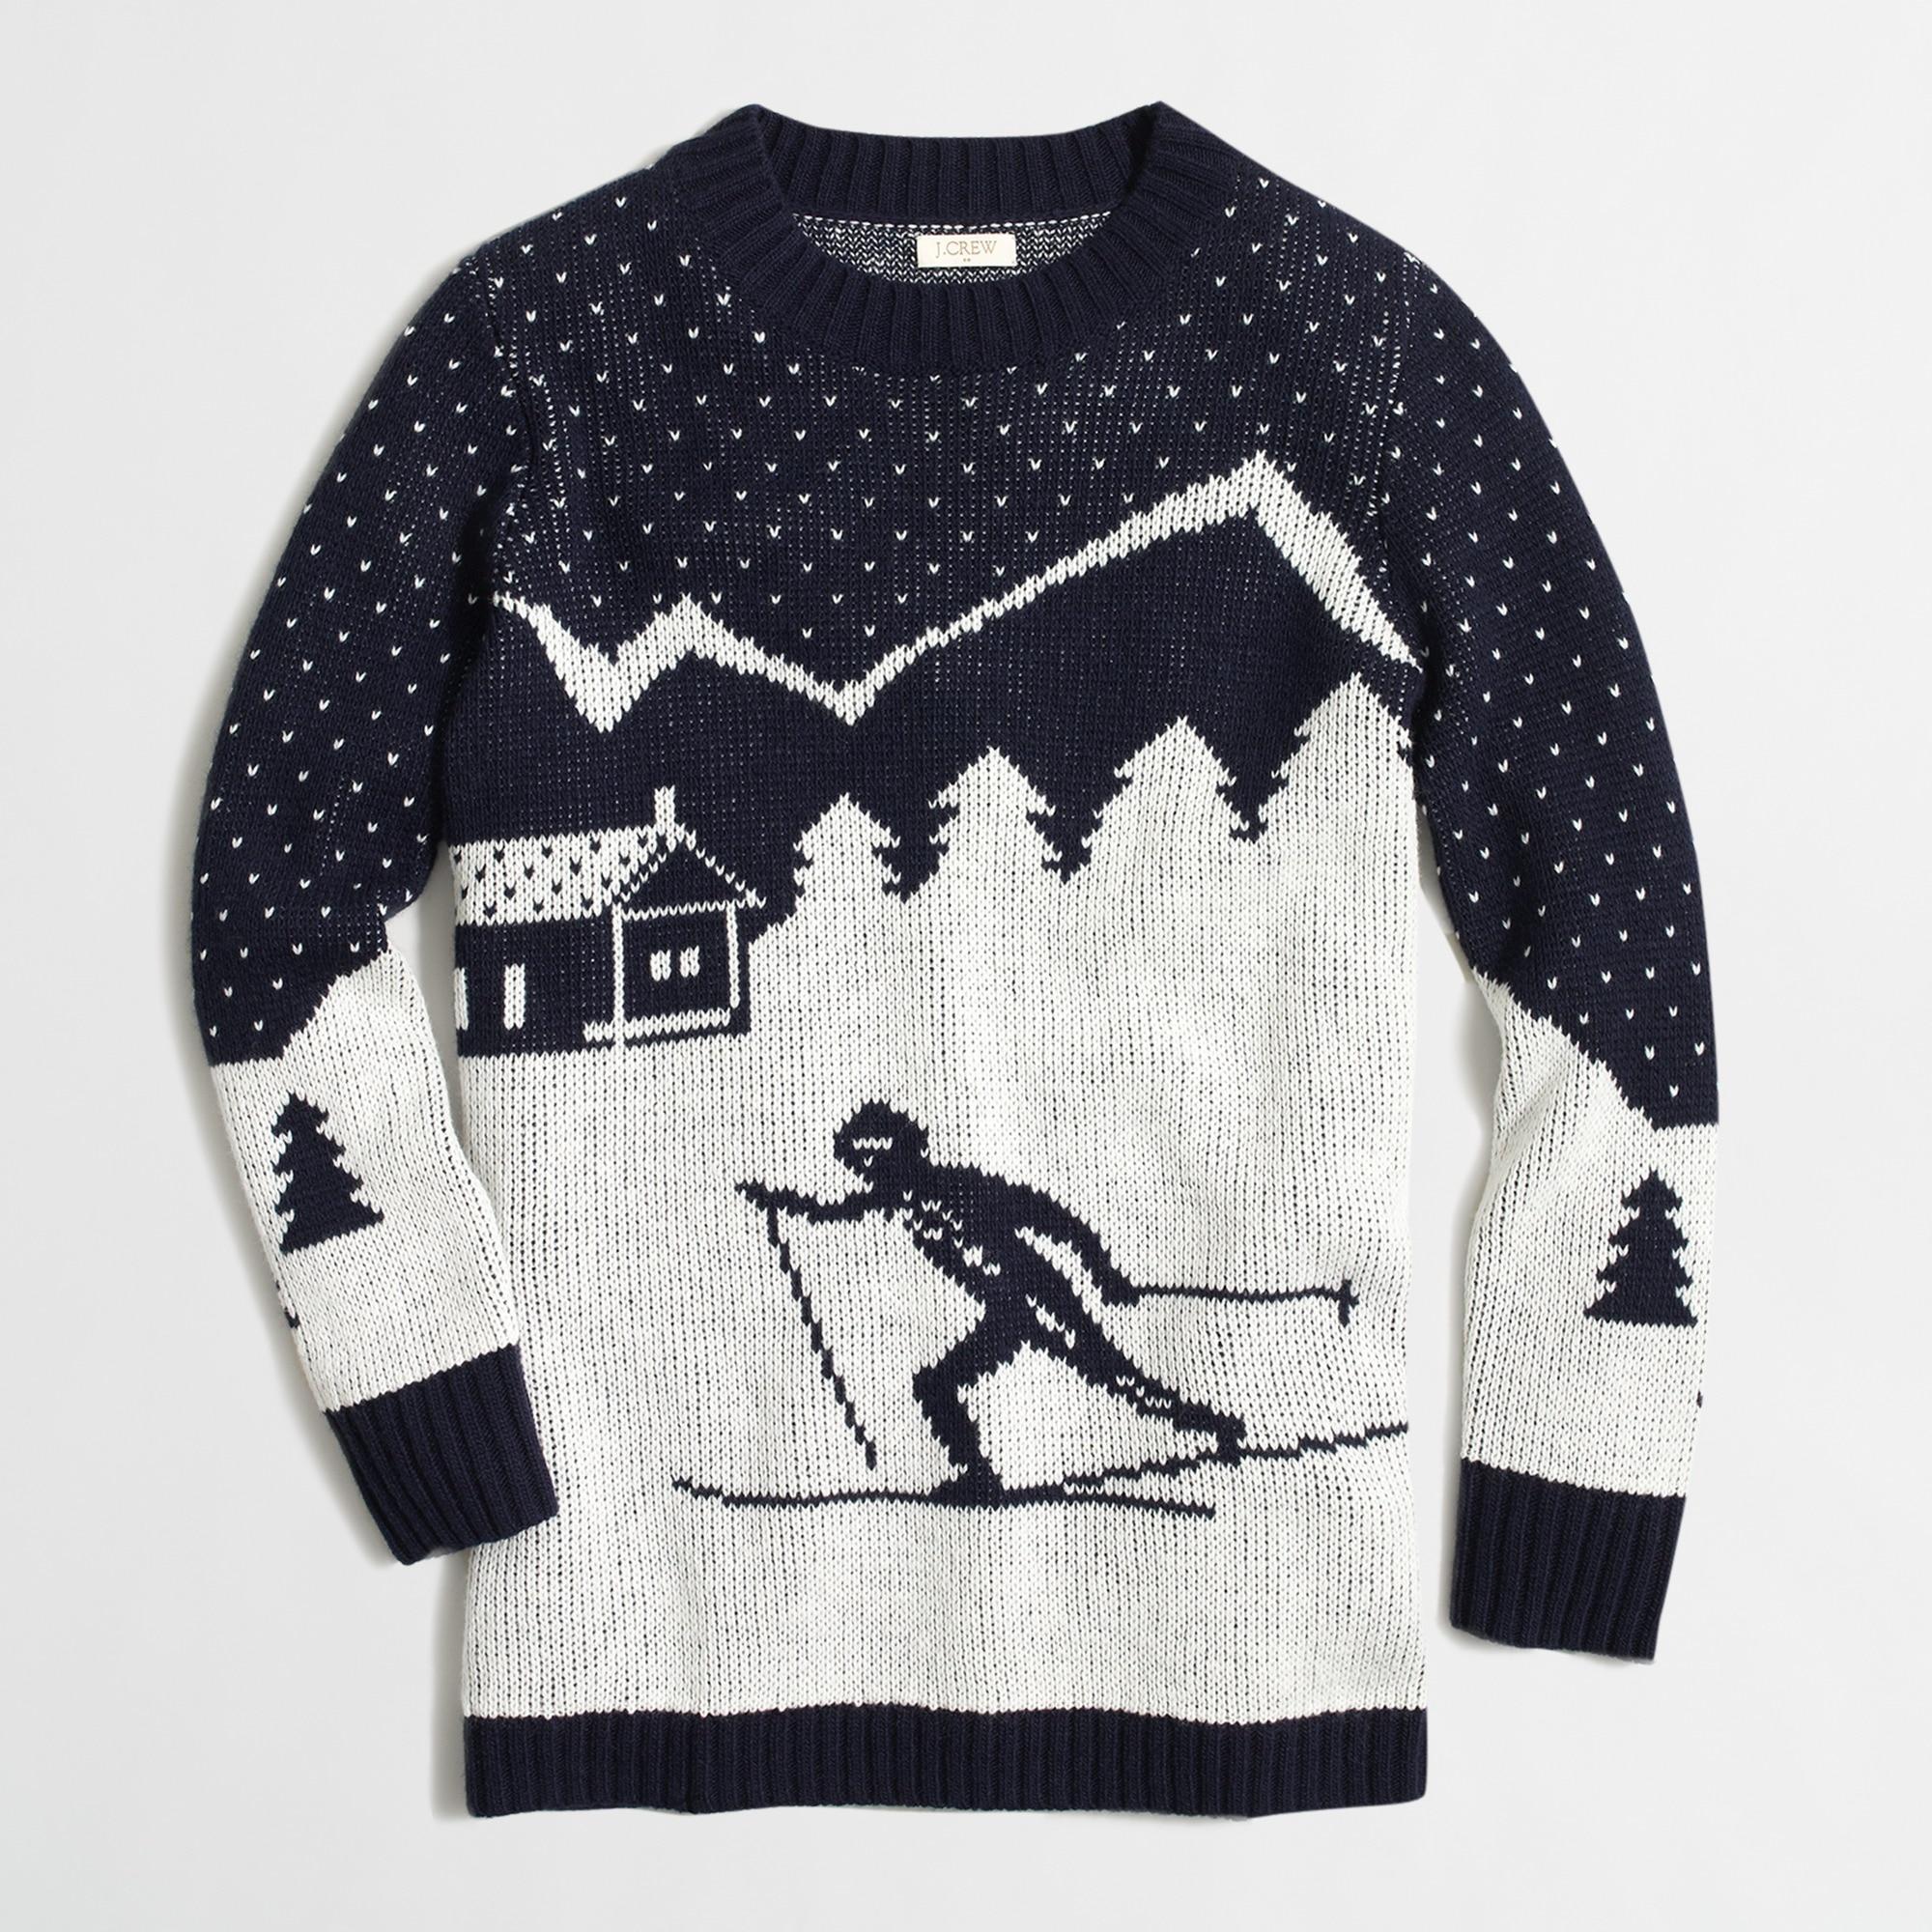 intarsia ski scene sweater : factorywomen pullovers